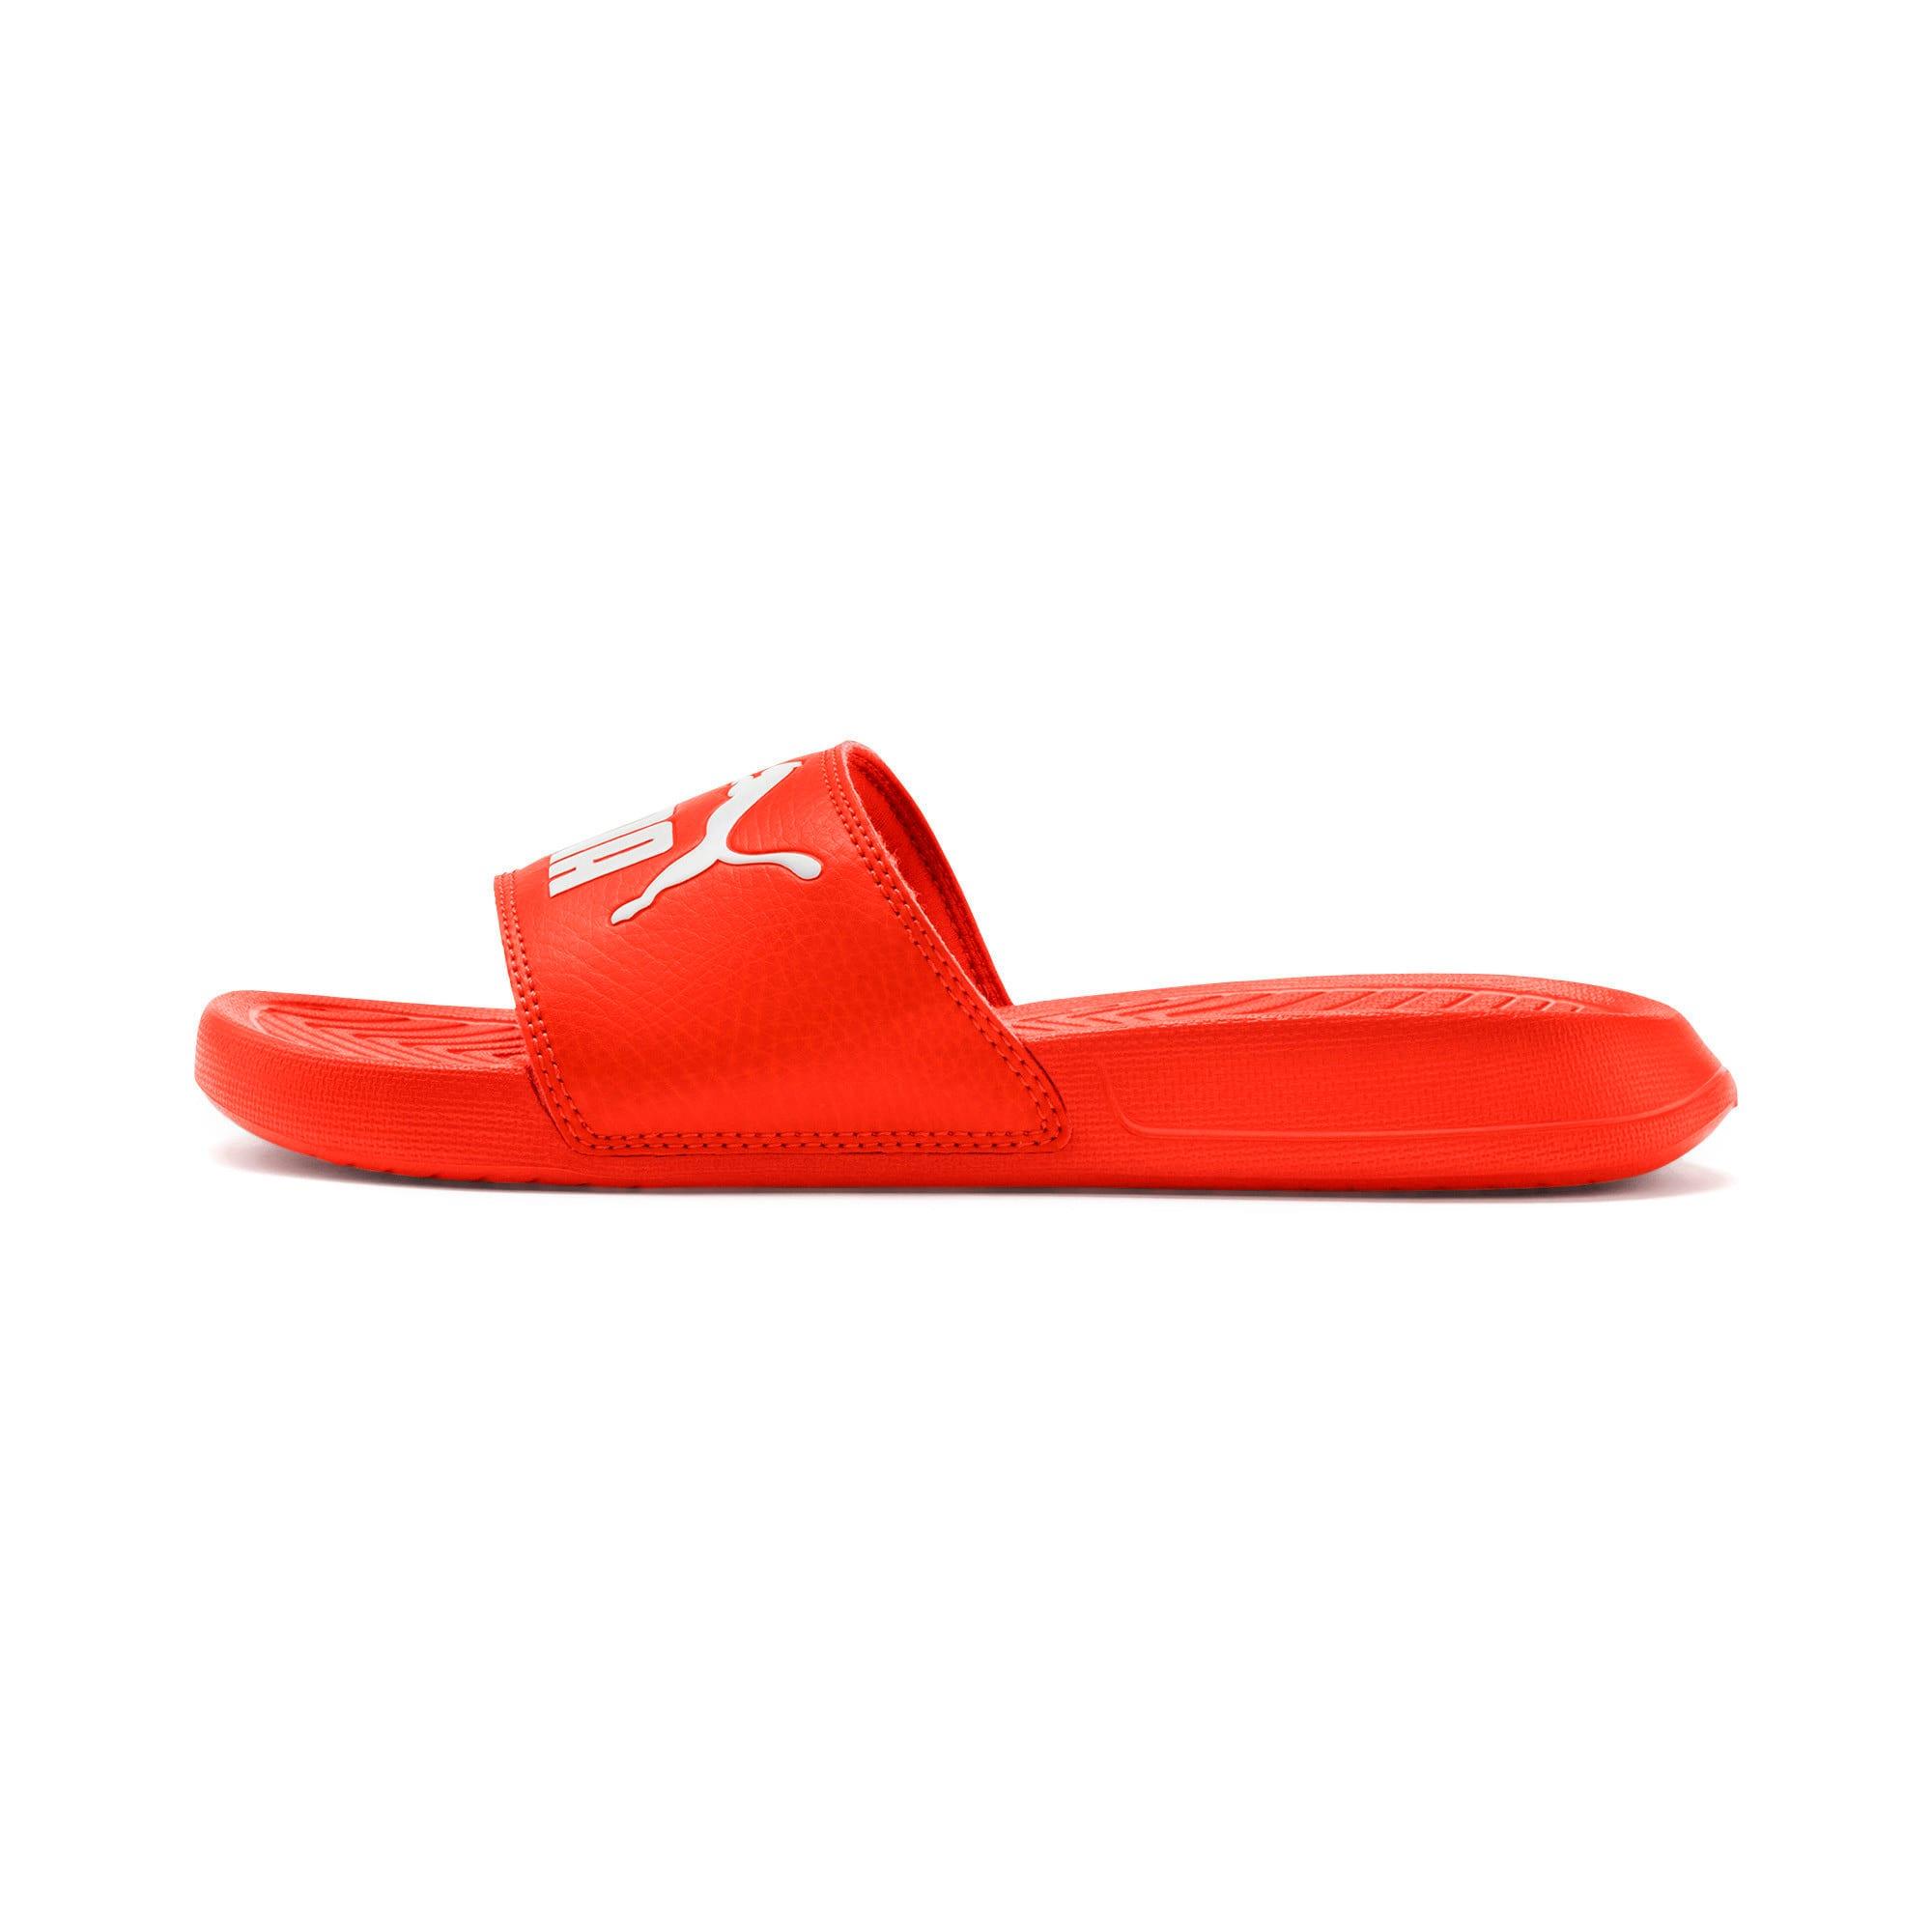 Thumbnail 1 of Popcat Youth Sandal, Cherry Tomato-Puma White, medium-IND